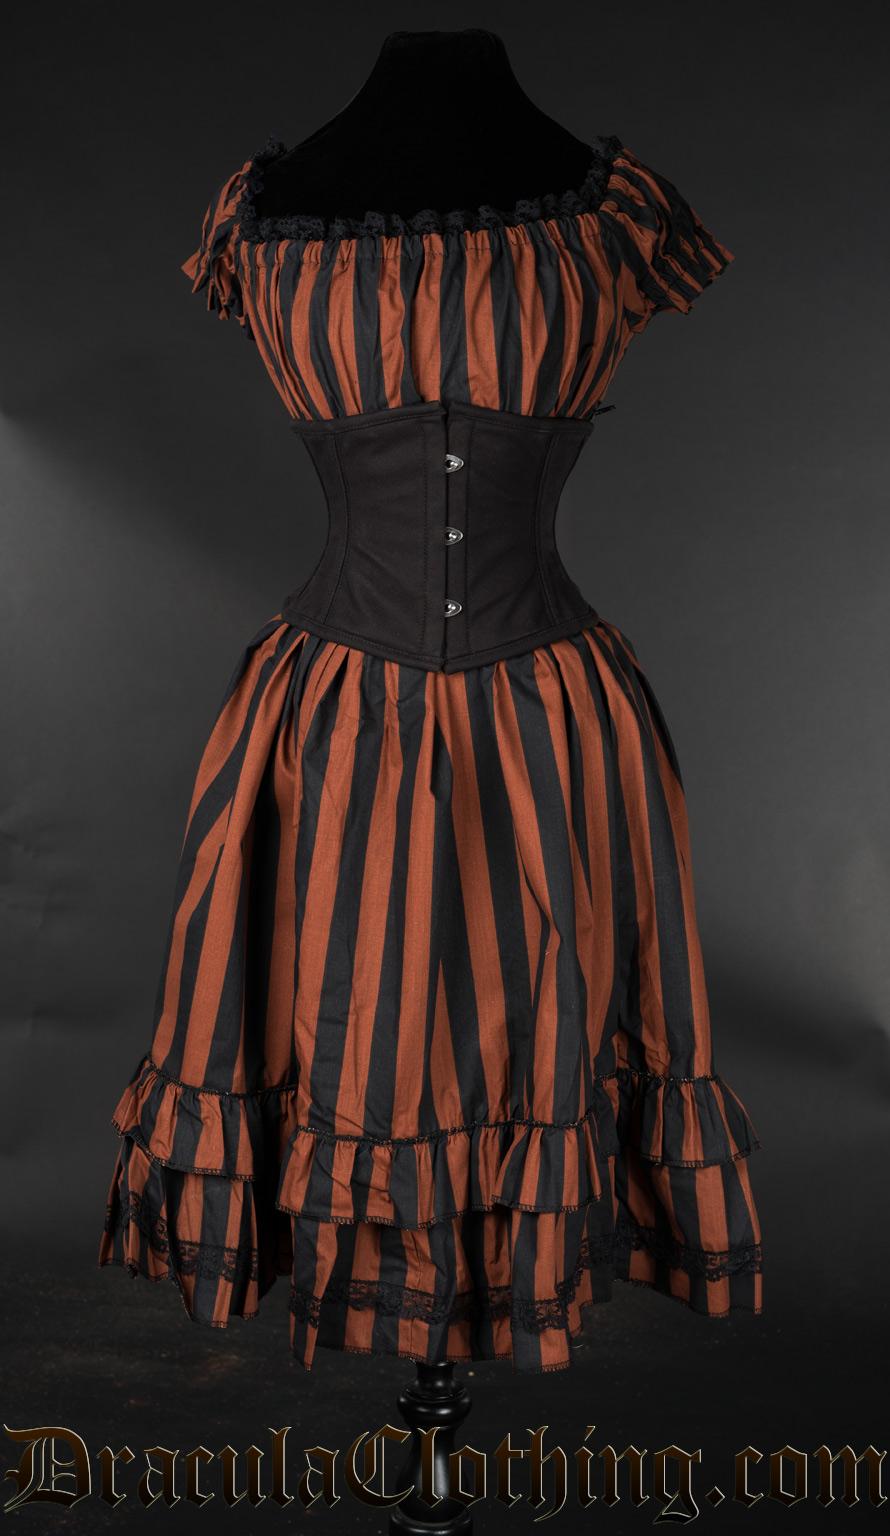 Brown Striped Gothabilly Dress